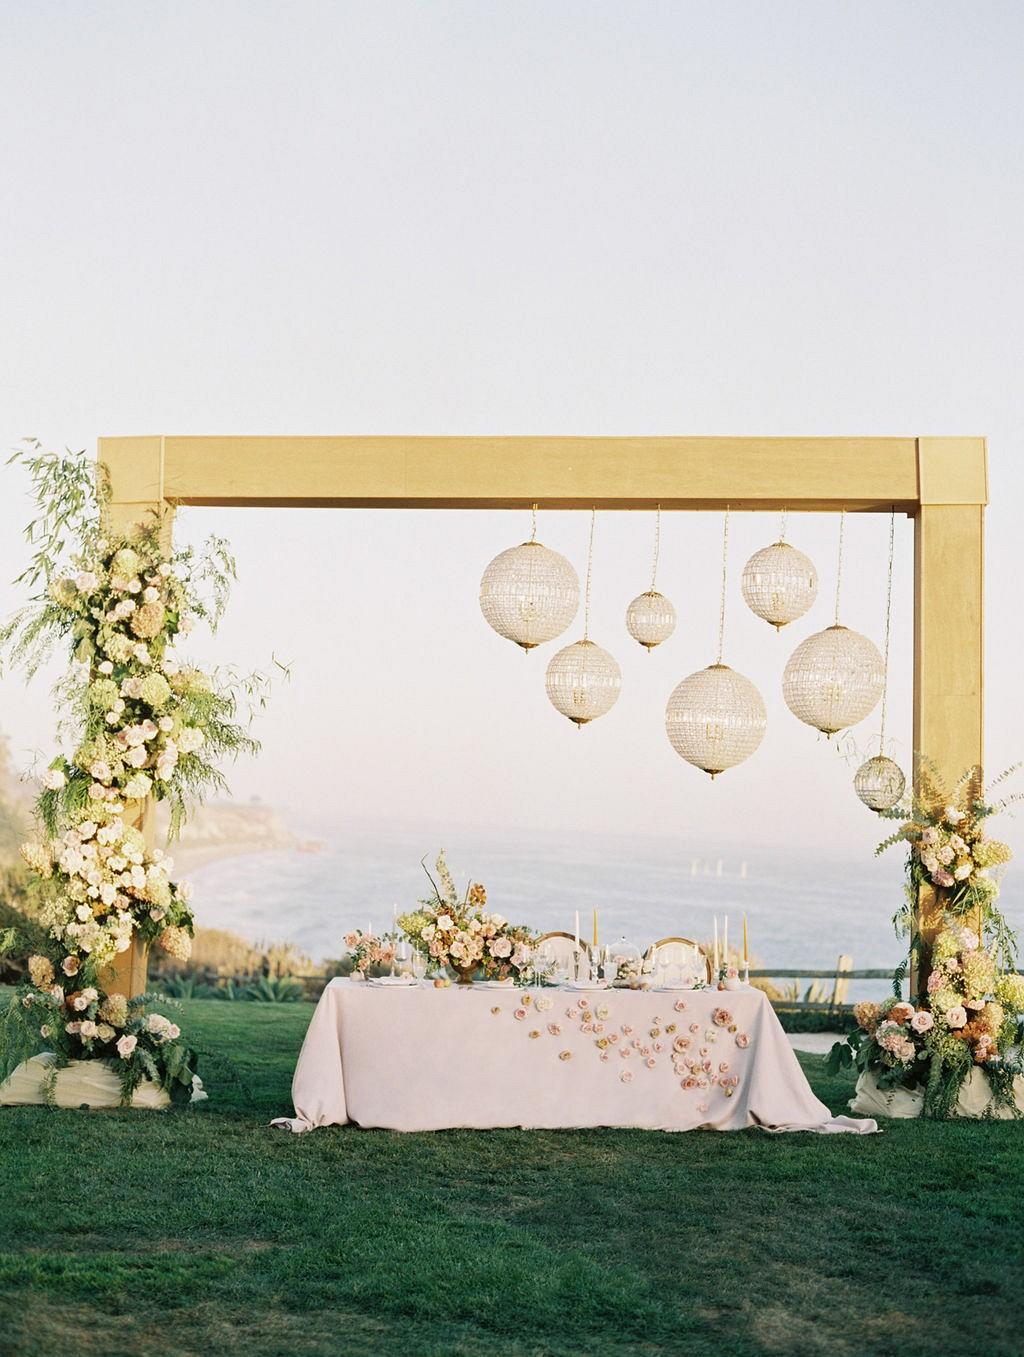 Blush and Copper Wedding Ideas at the Ritz Carlton Bacara